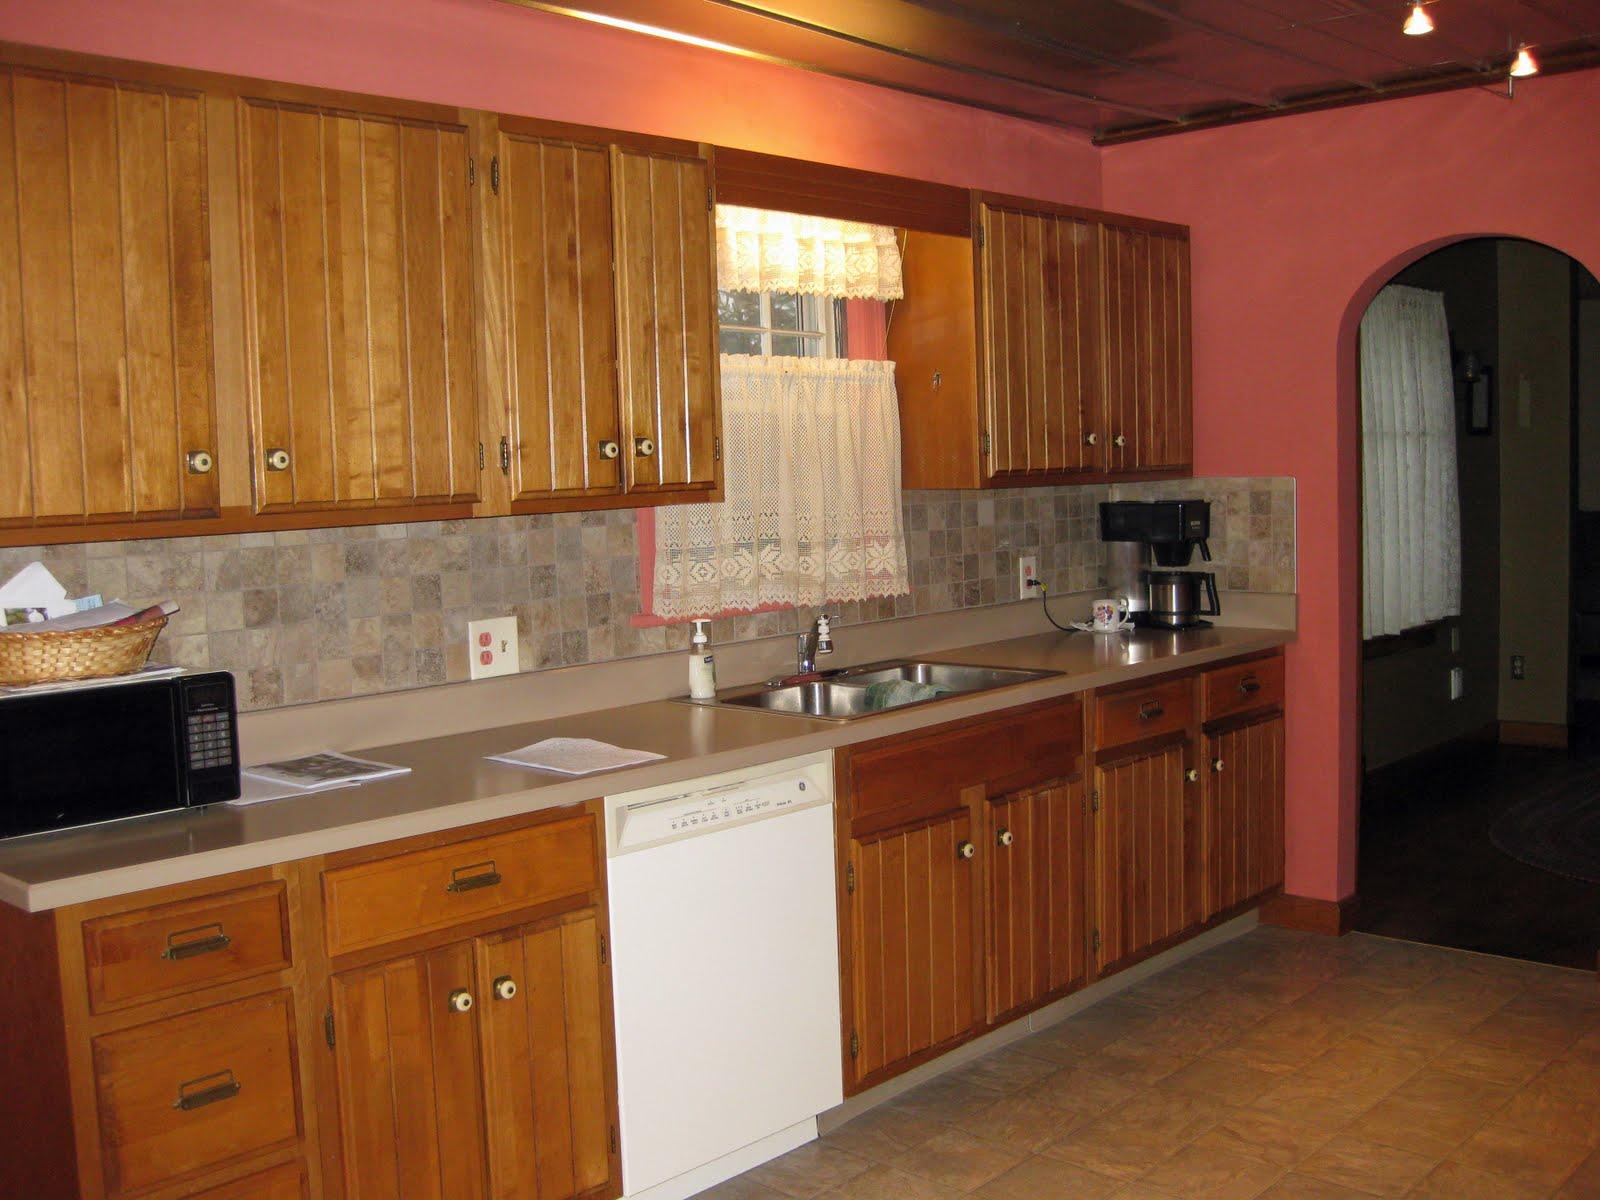 kitchen ideas oak cabinets photo - 5